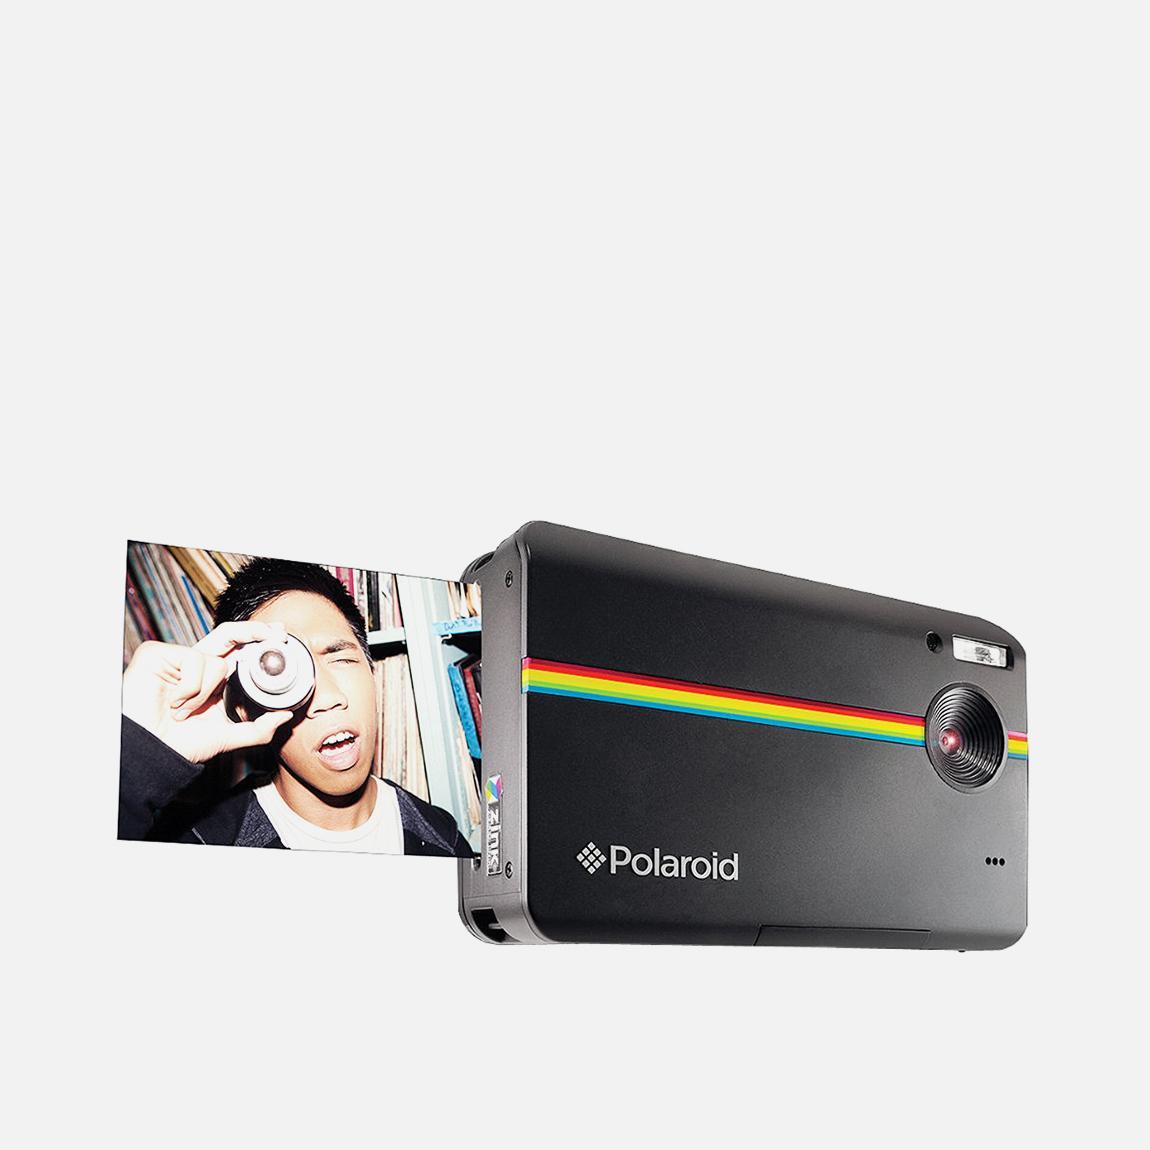 607a470105c Polaroid Z2300 Instant digital Camera - Black Polaroid Camera    Superbalist.com